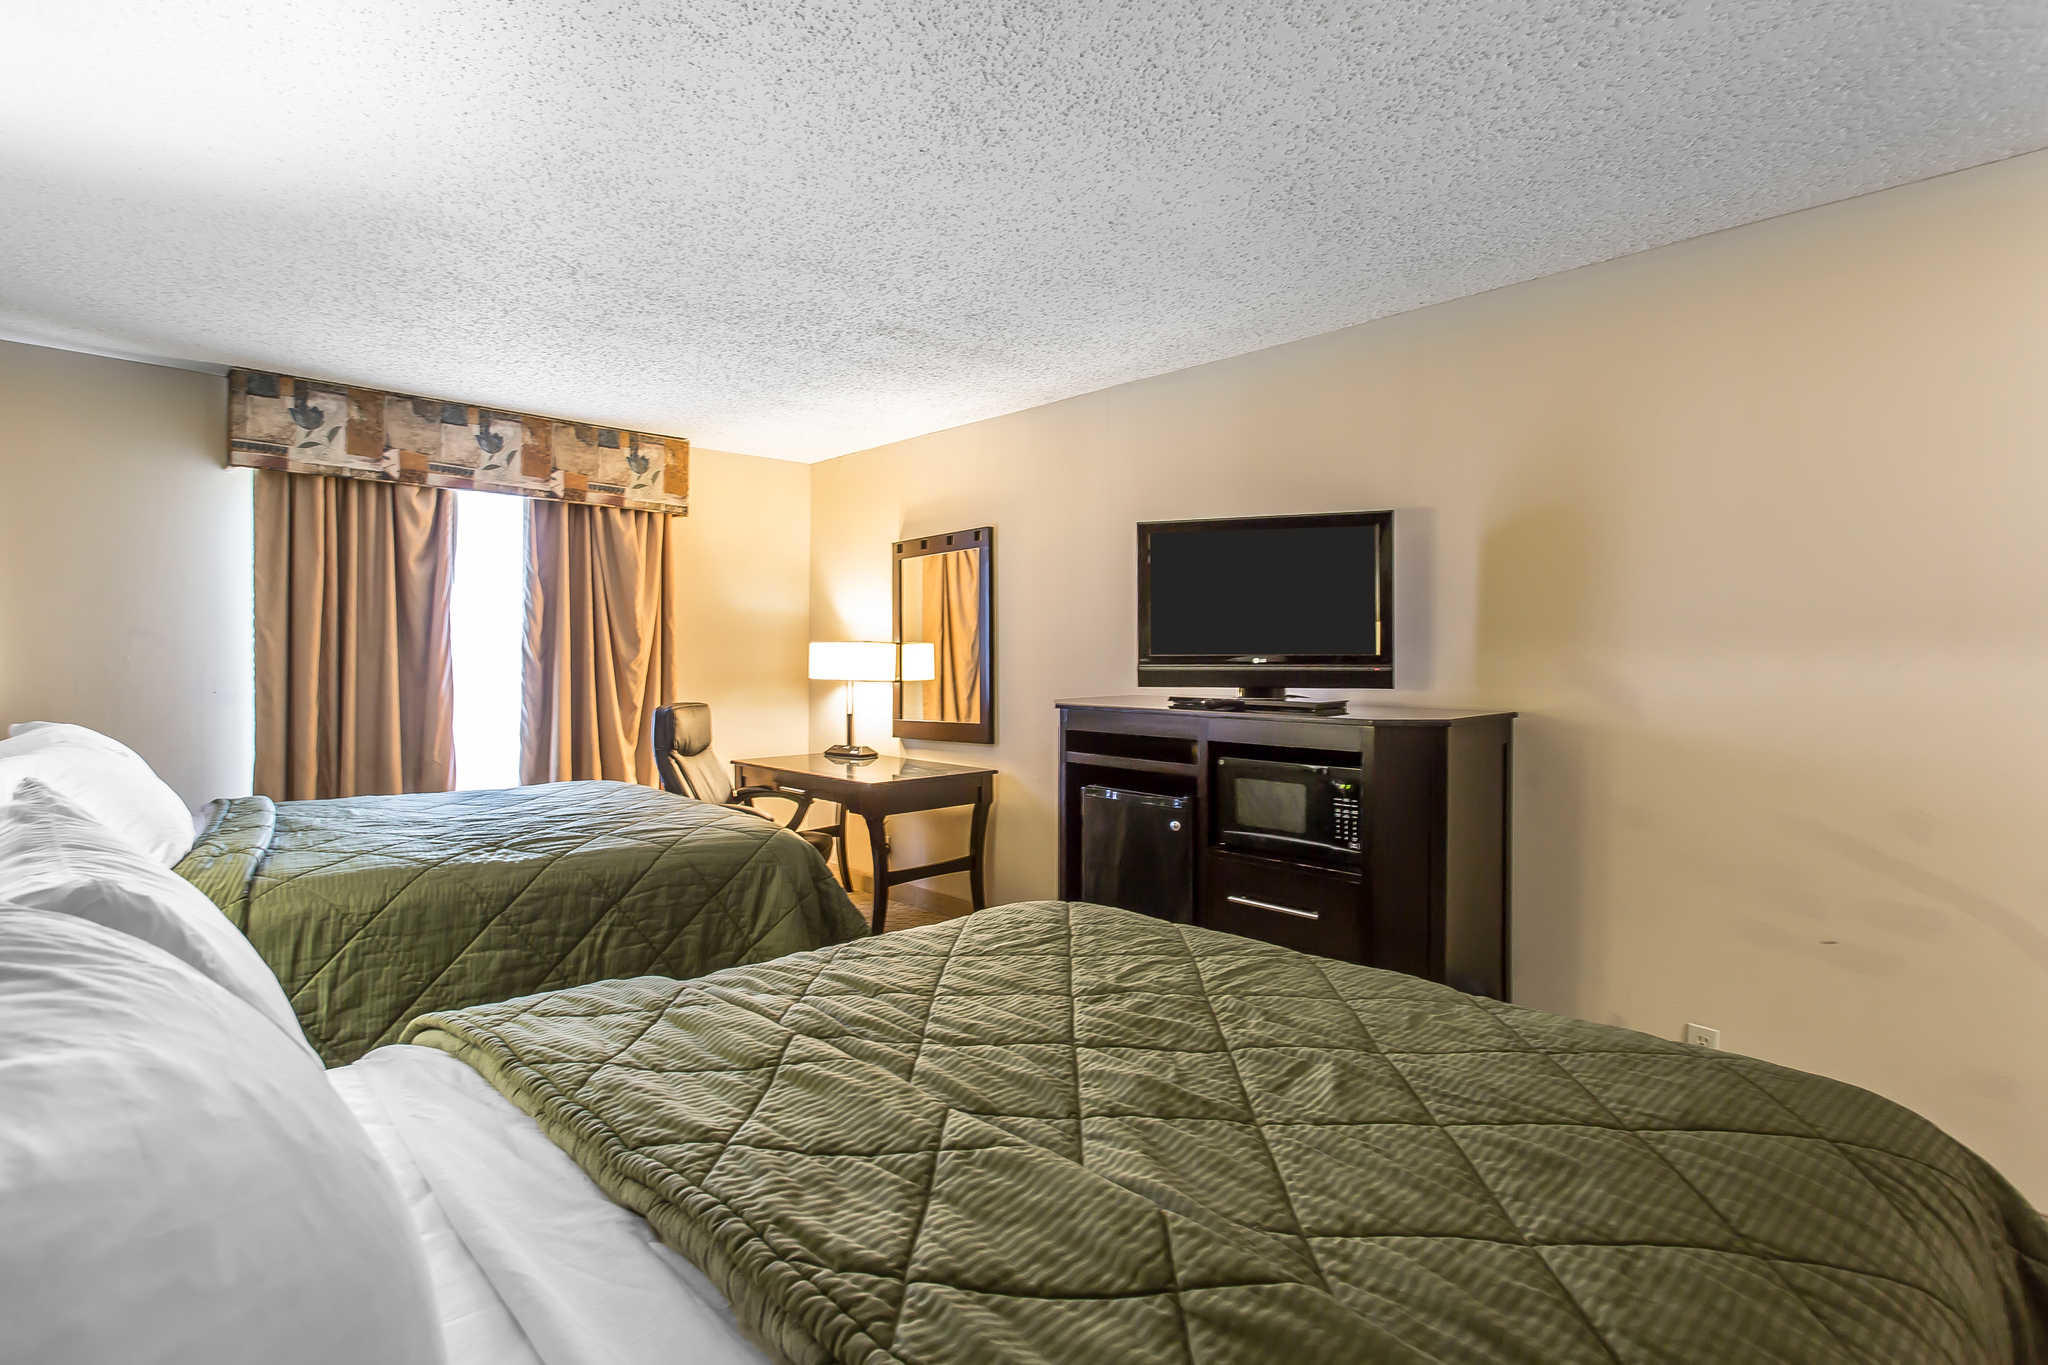 Quality Inn & Suites Durant image 15